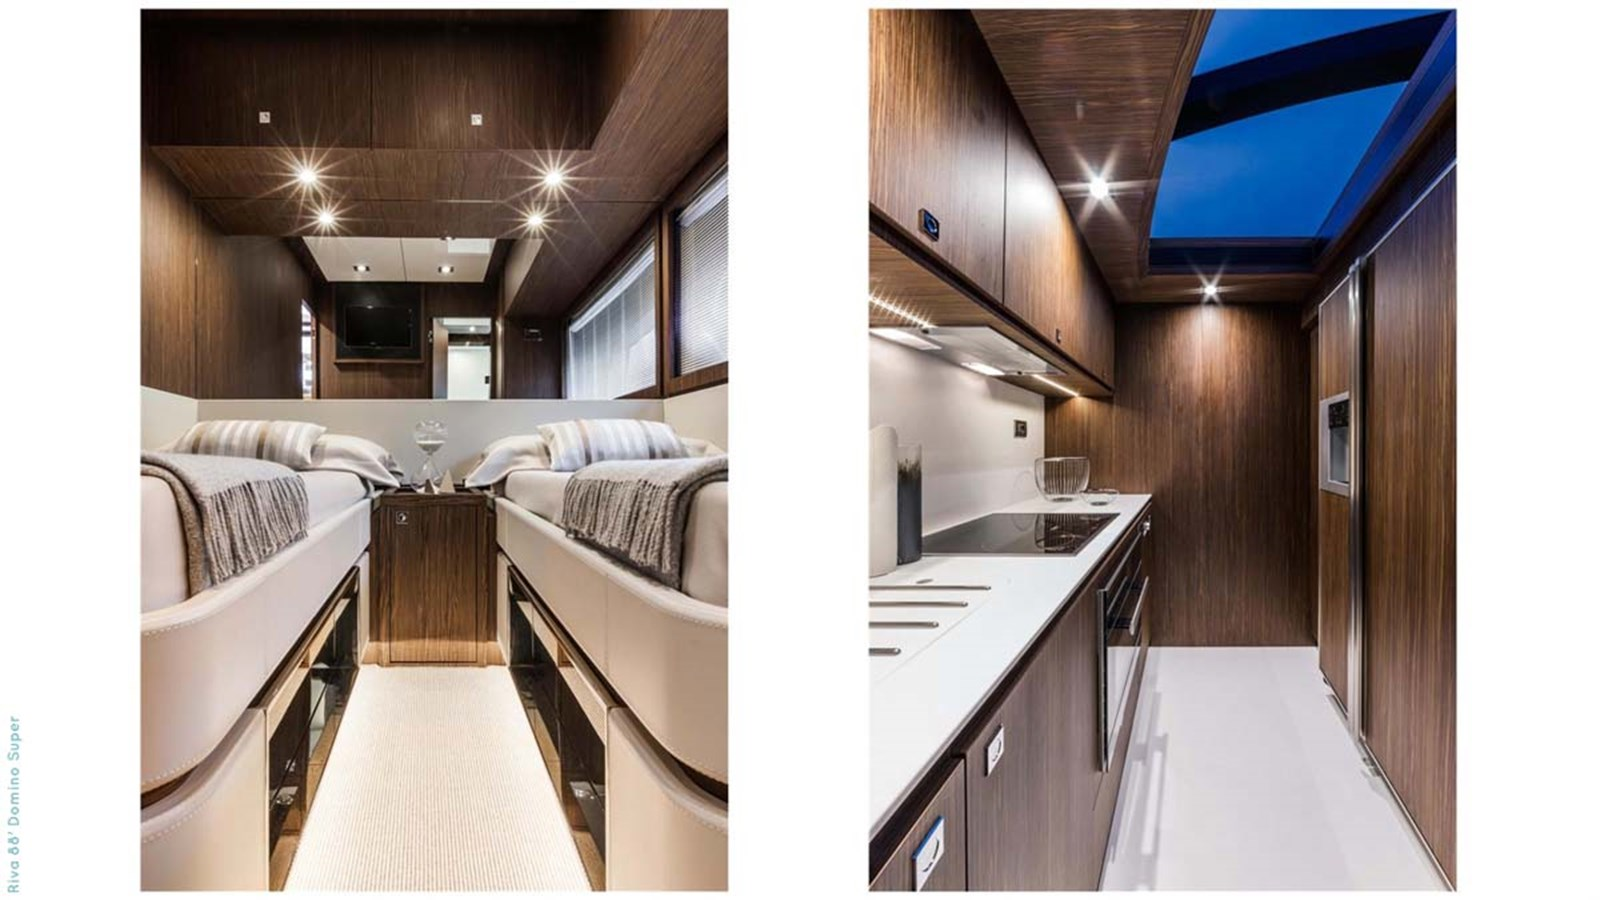 8726-Riva 88 Domino Super 2017 RIVAL YACHTS INC  Motor Yacht 2851185